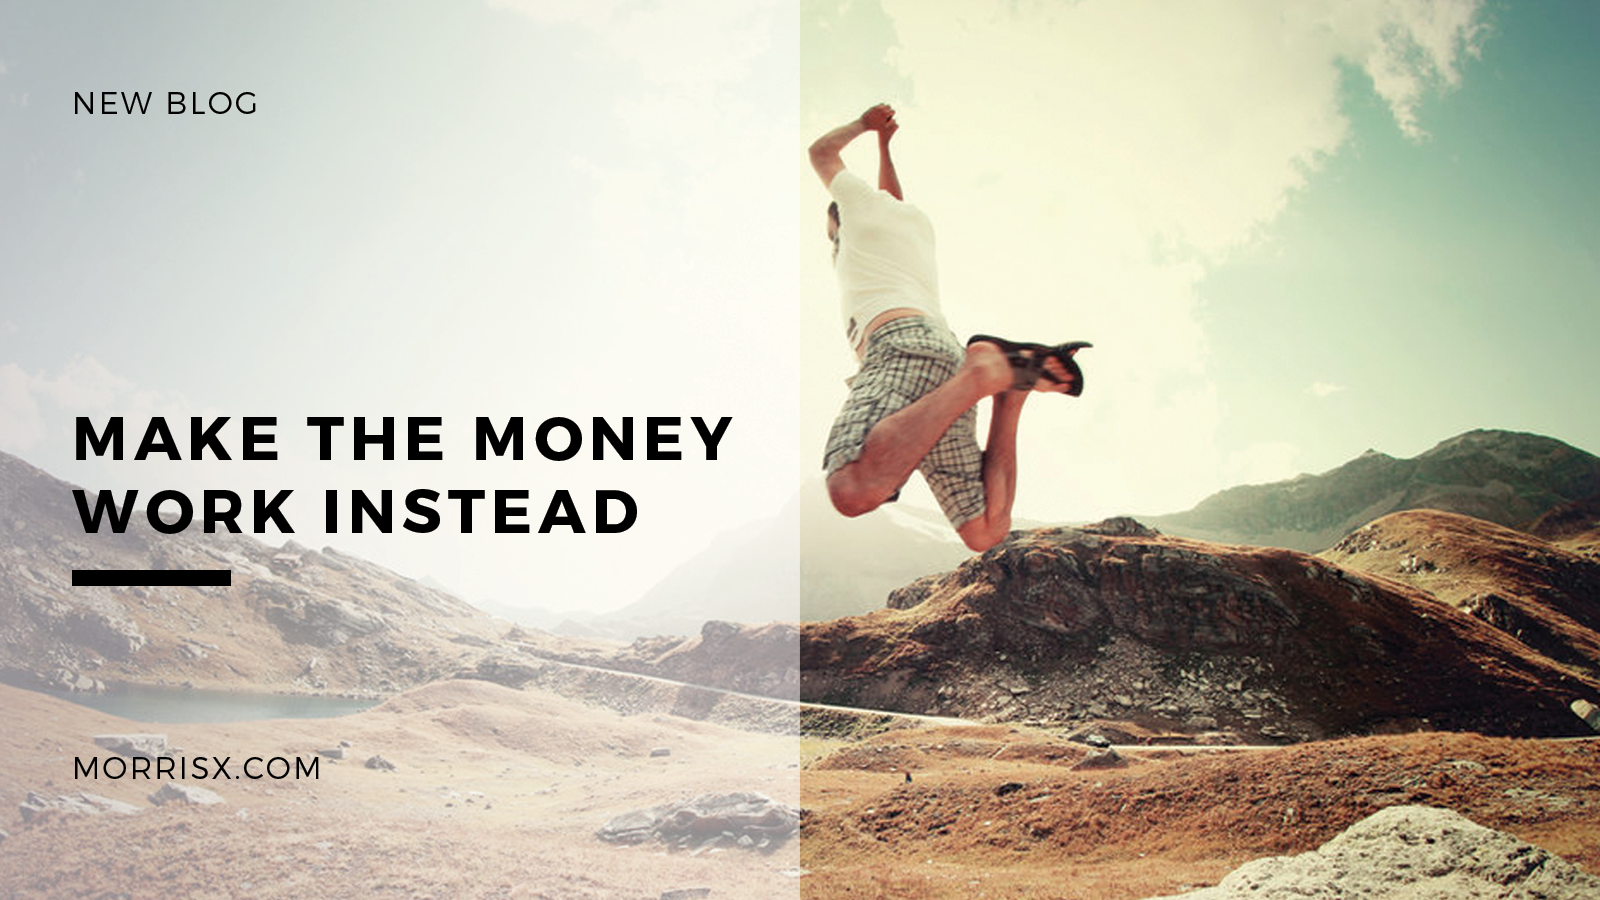 Make the Money Work Instead